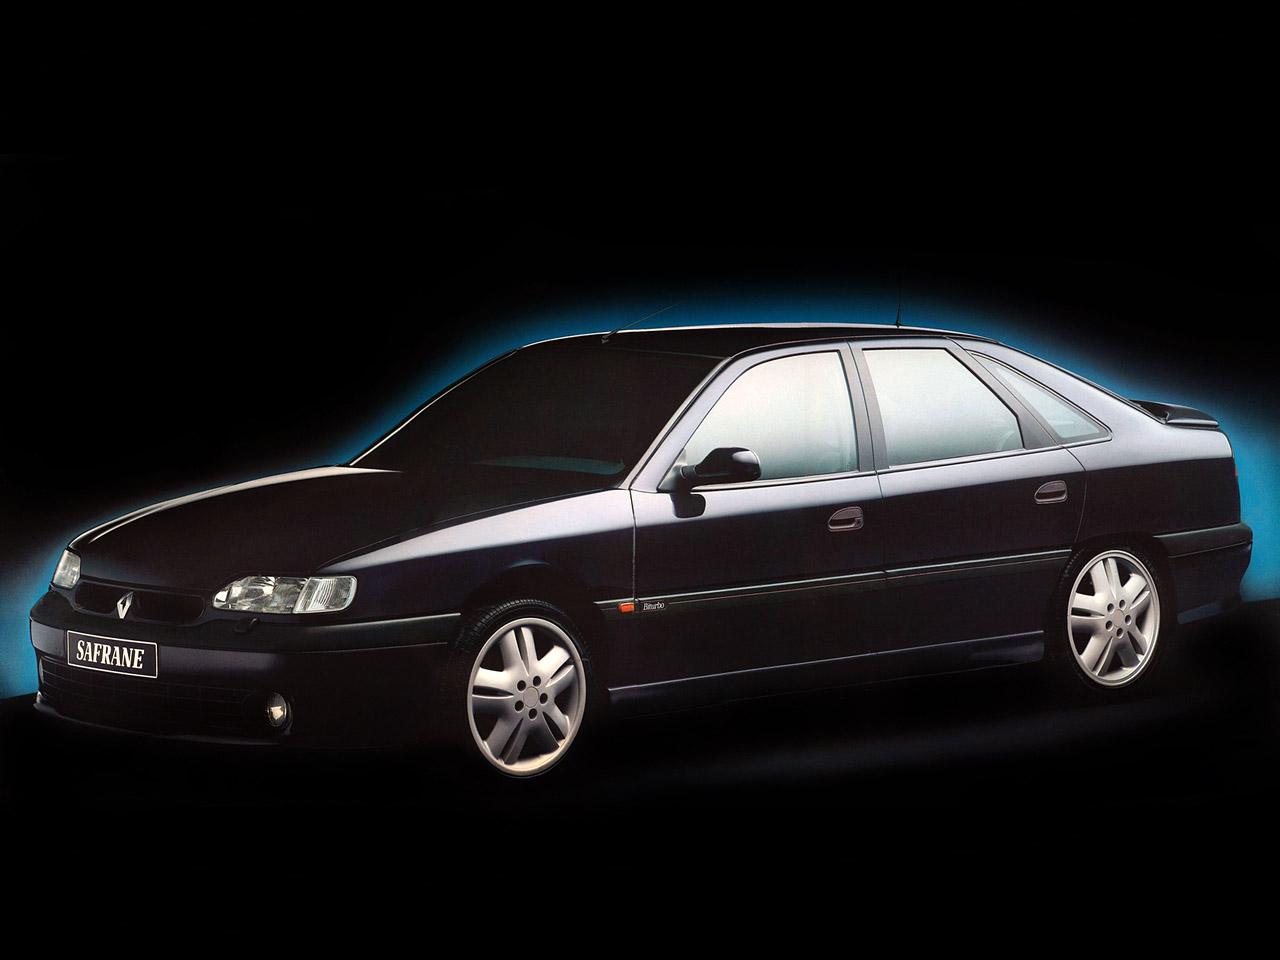 renault_safrane-bi-turbo-1993-96_r2_jpg.jpg